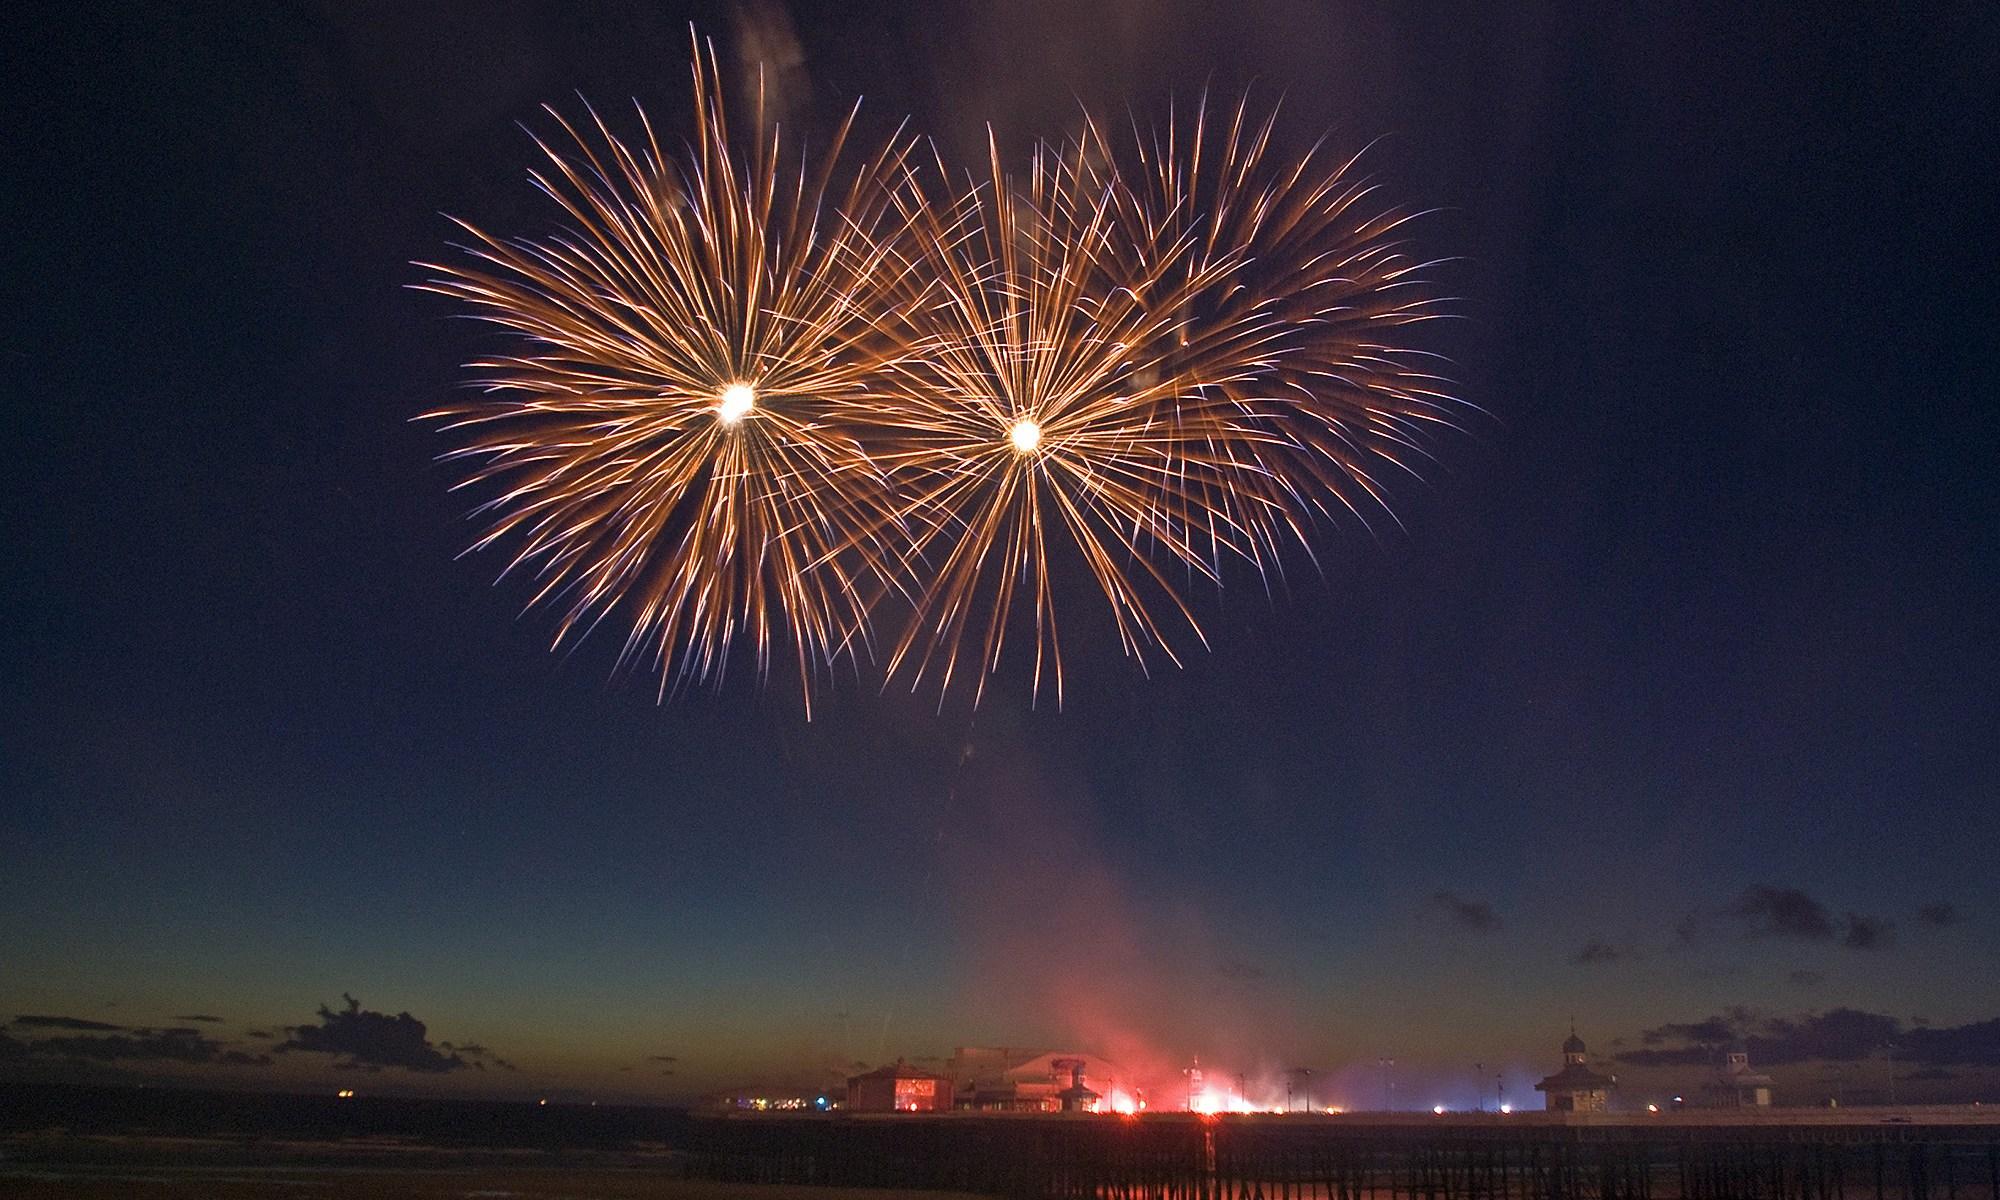 Bonfire Night - Fireworks from Blackpool